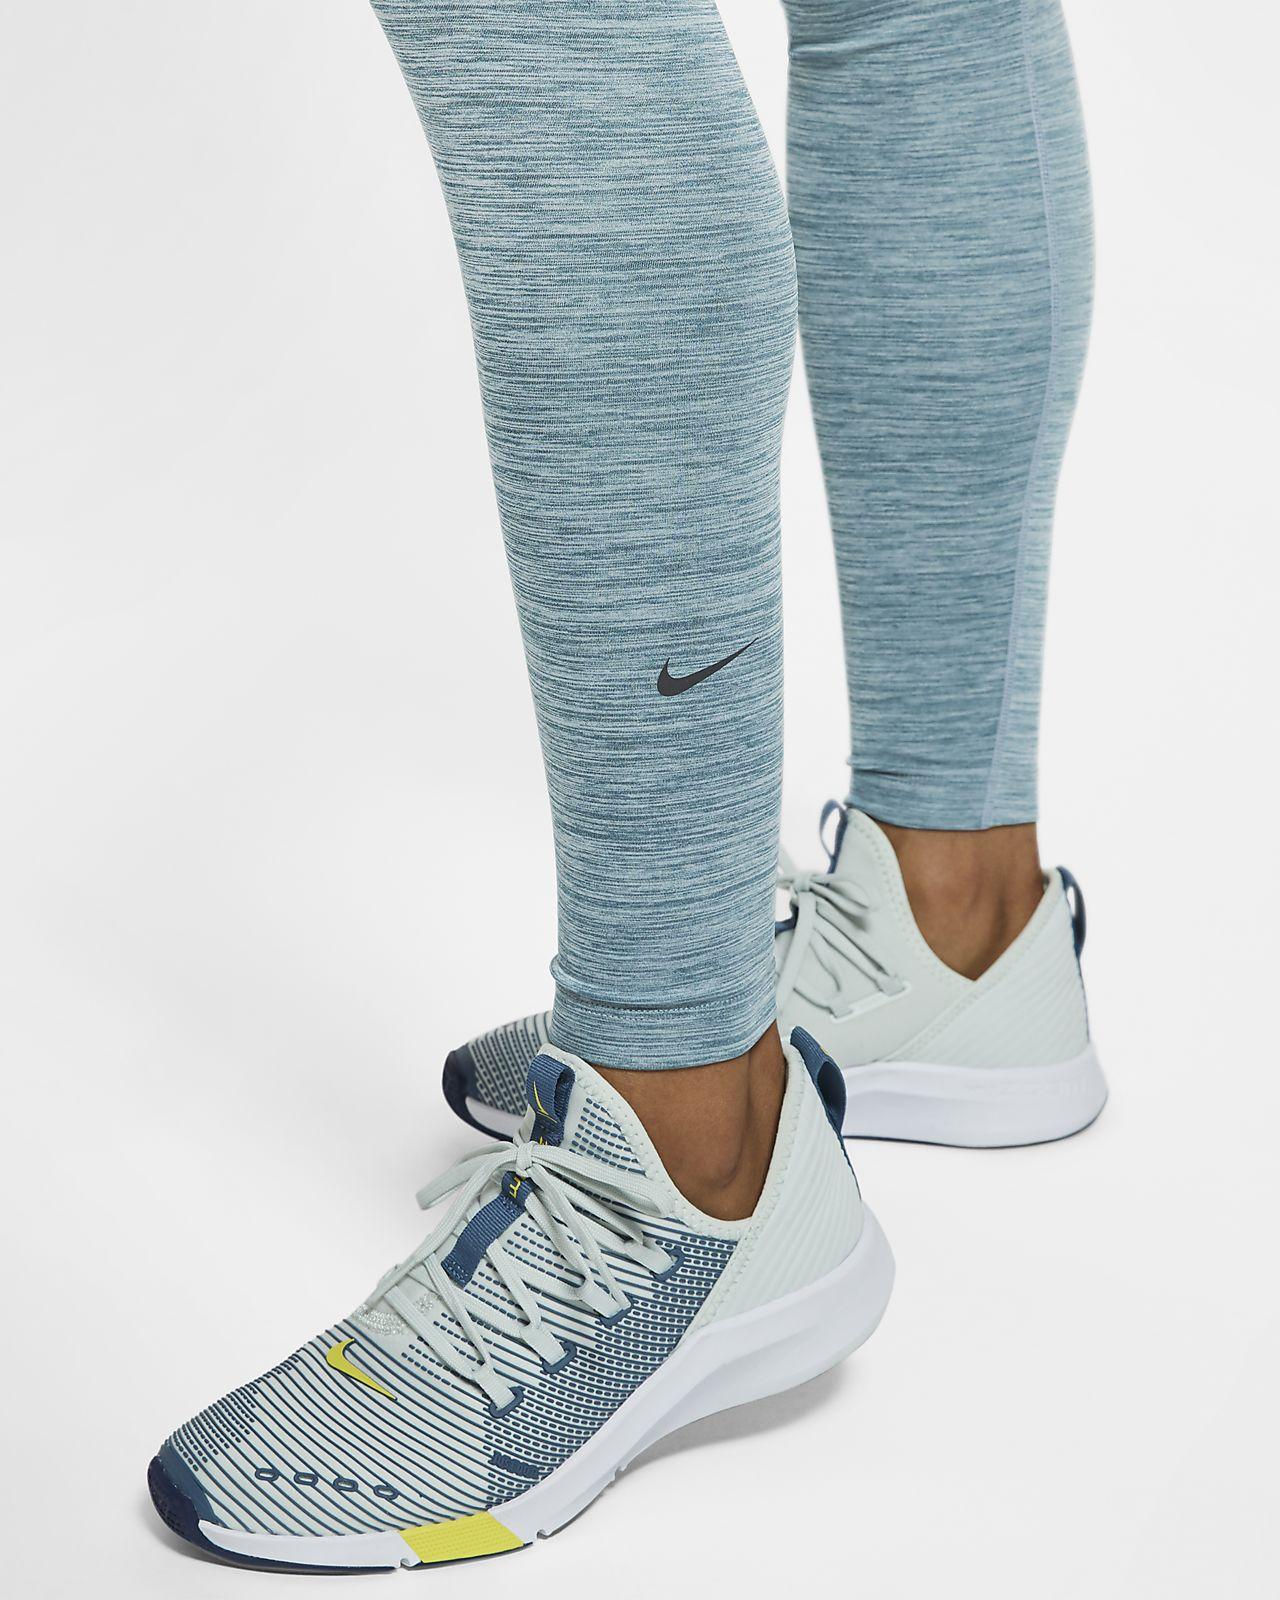 Nike Free X Metcon 2 Womens Training Light Redwood Shoe